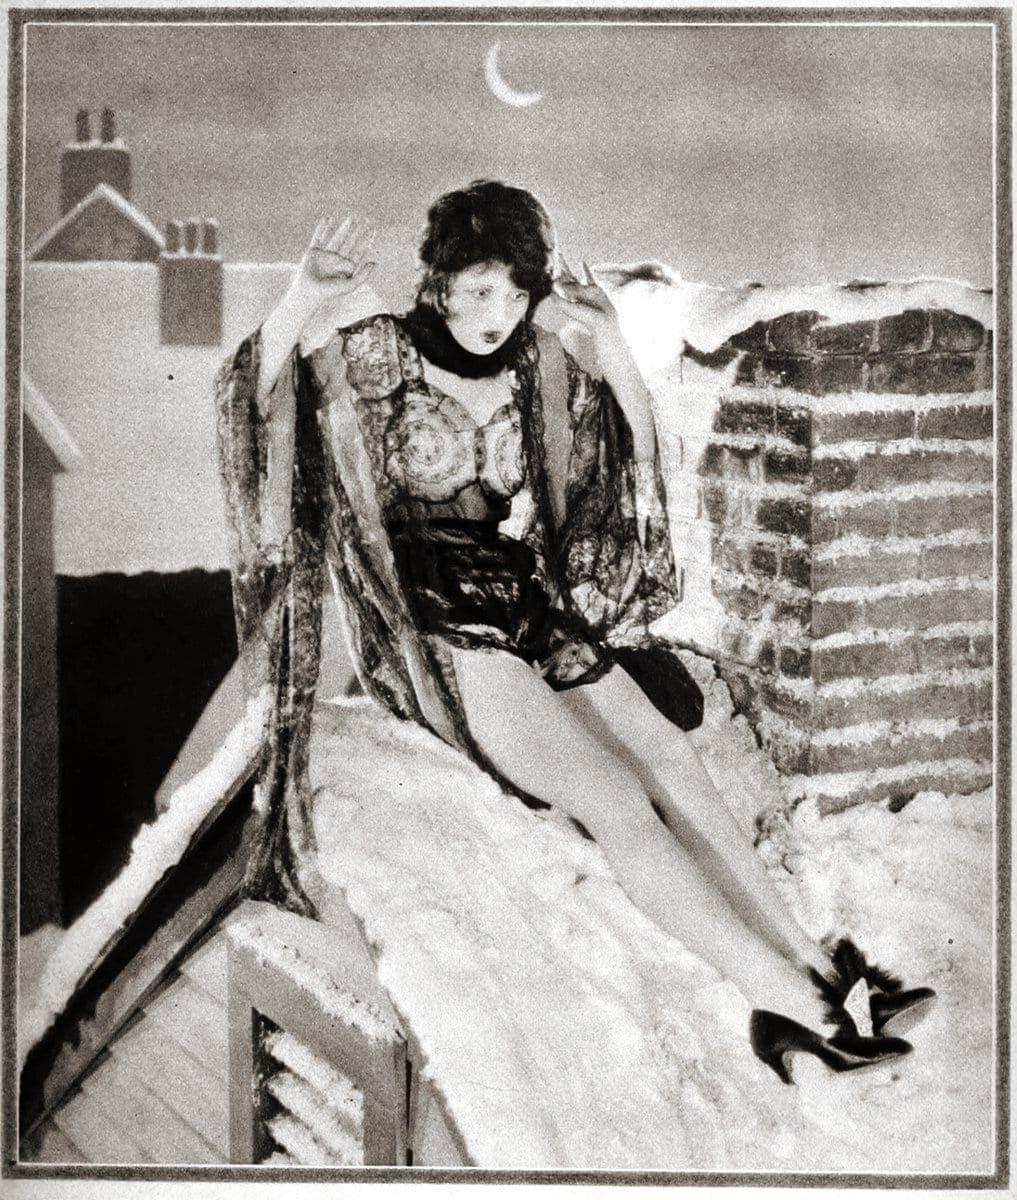 Vintage 1920s flapper fashions